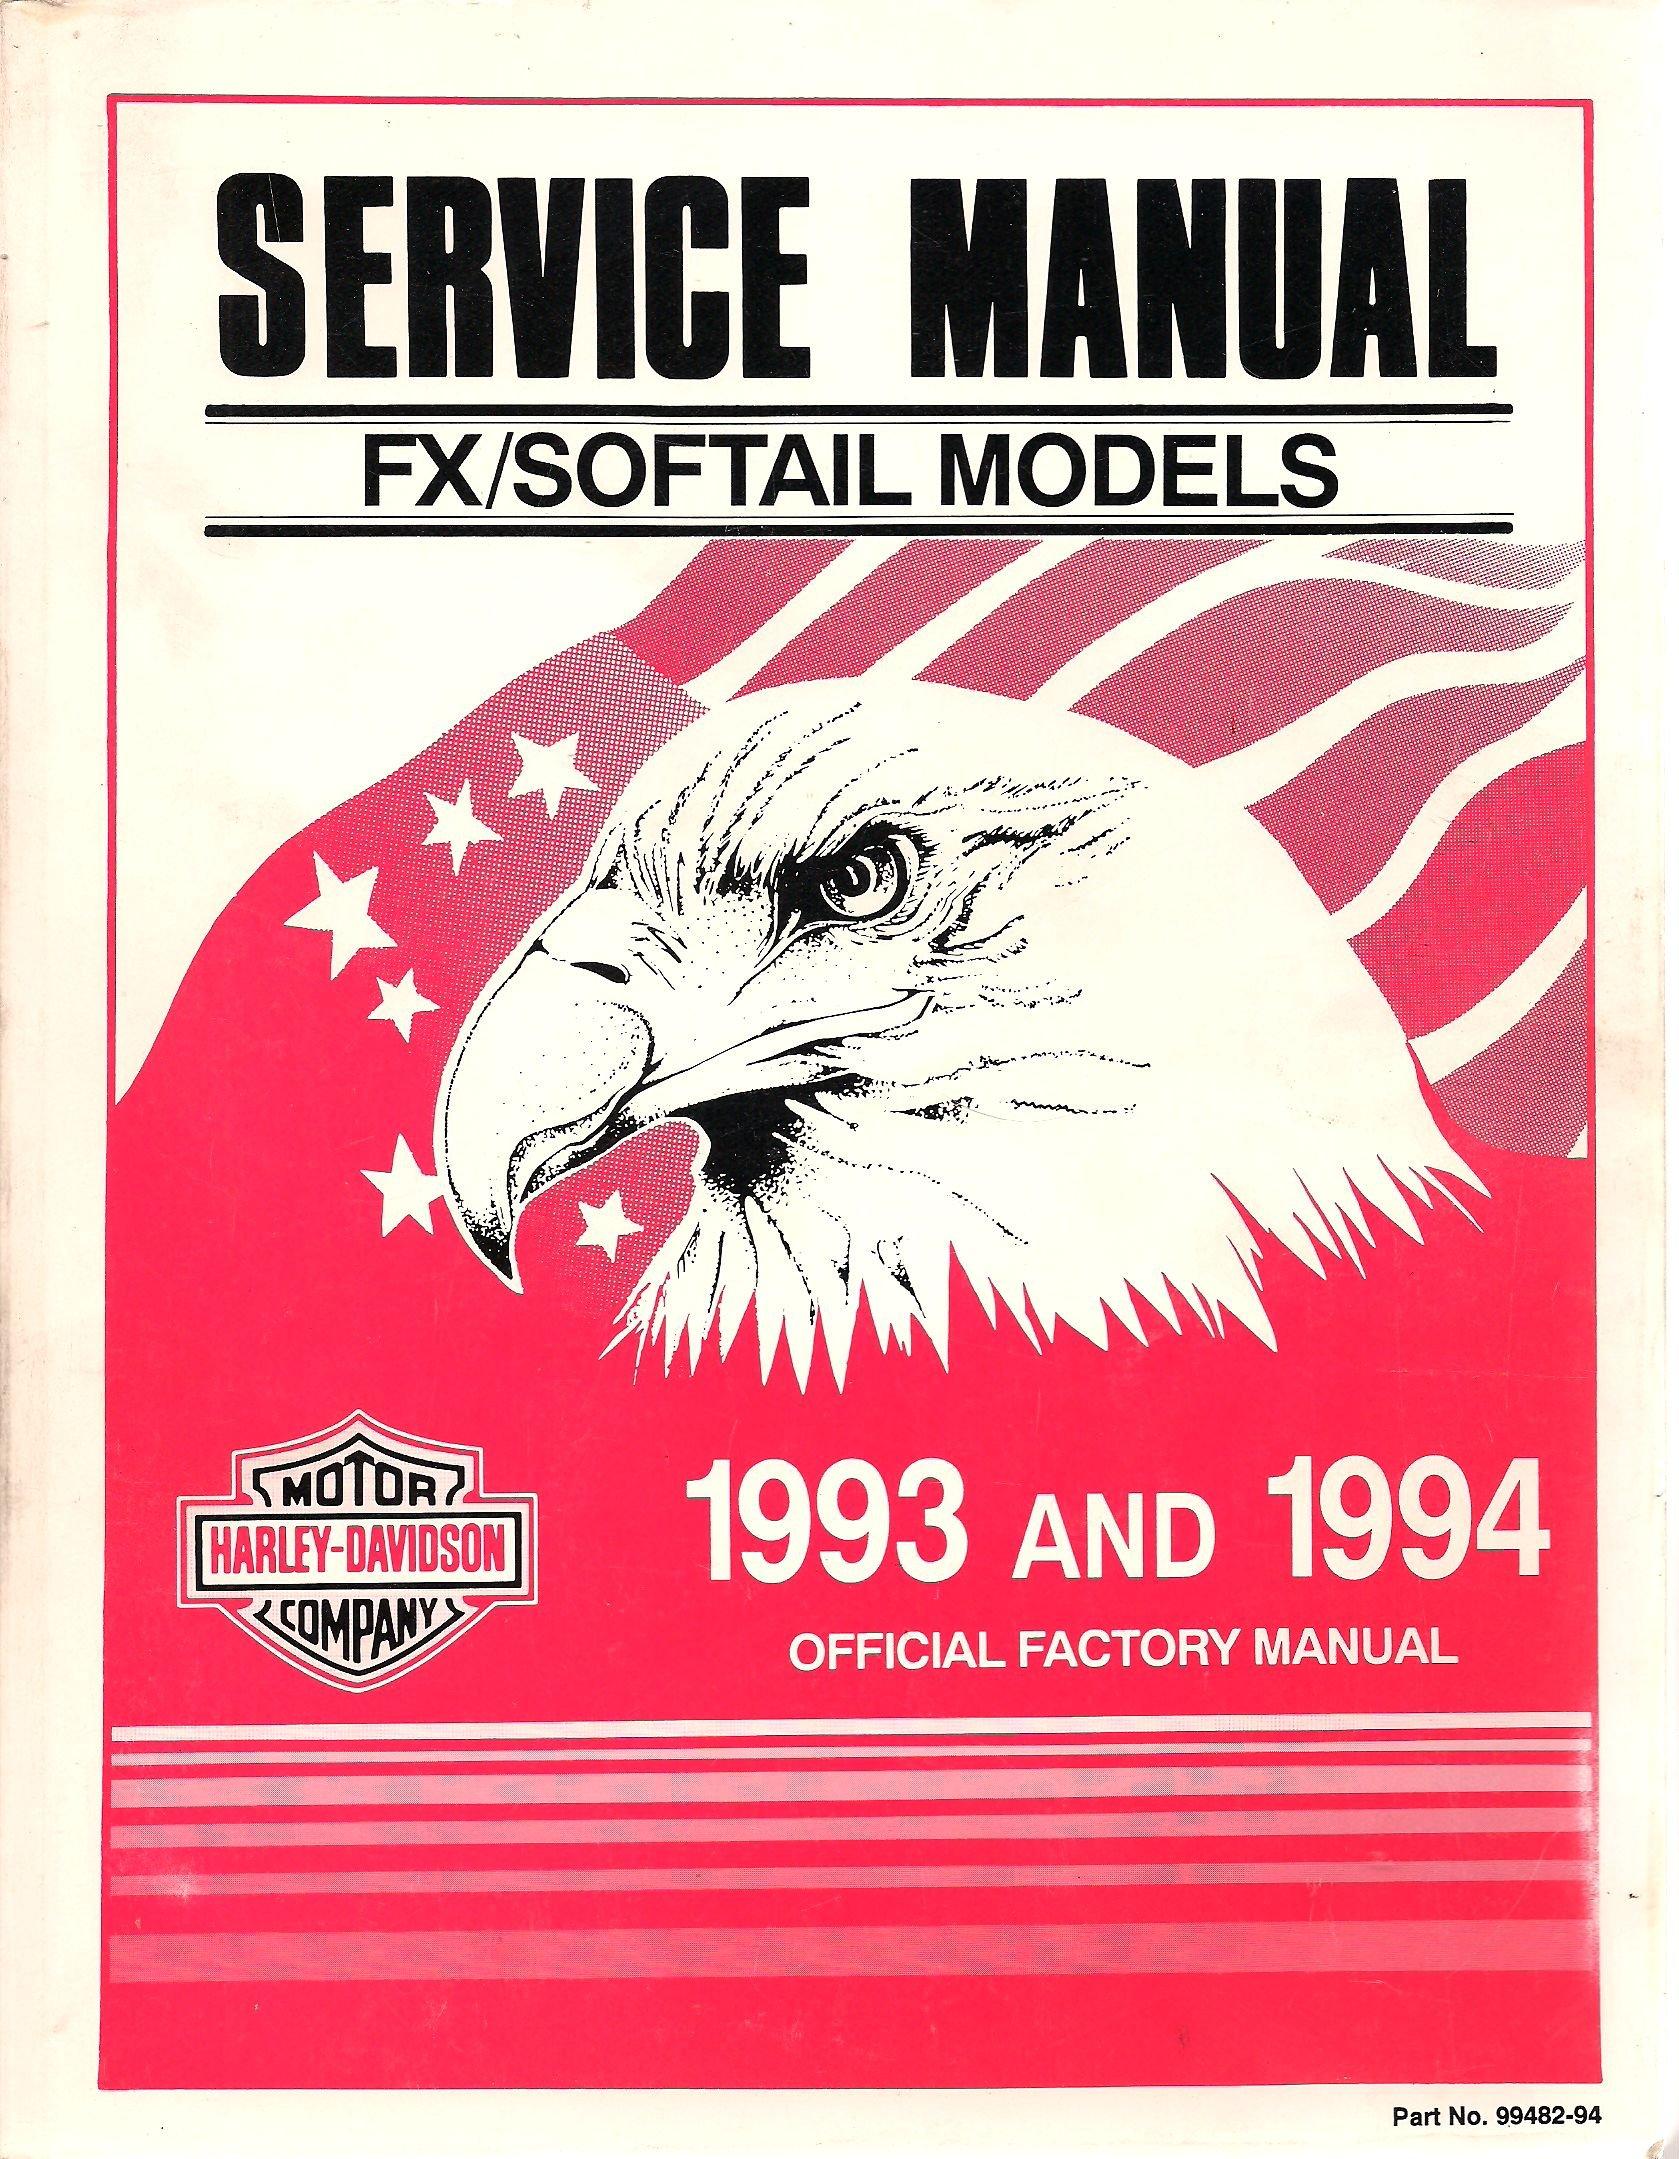 Harley-Davidson Official Factory Service Manual FX/Softail Models 1993 &  1994: Inc. Harley-Davidson: Amazon.com: Books